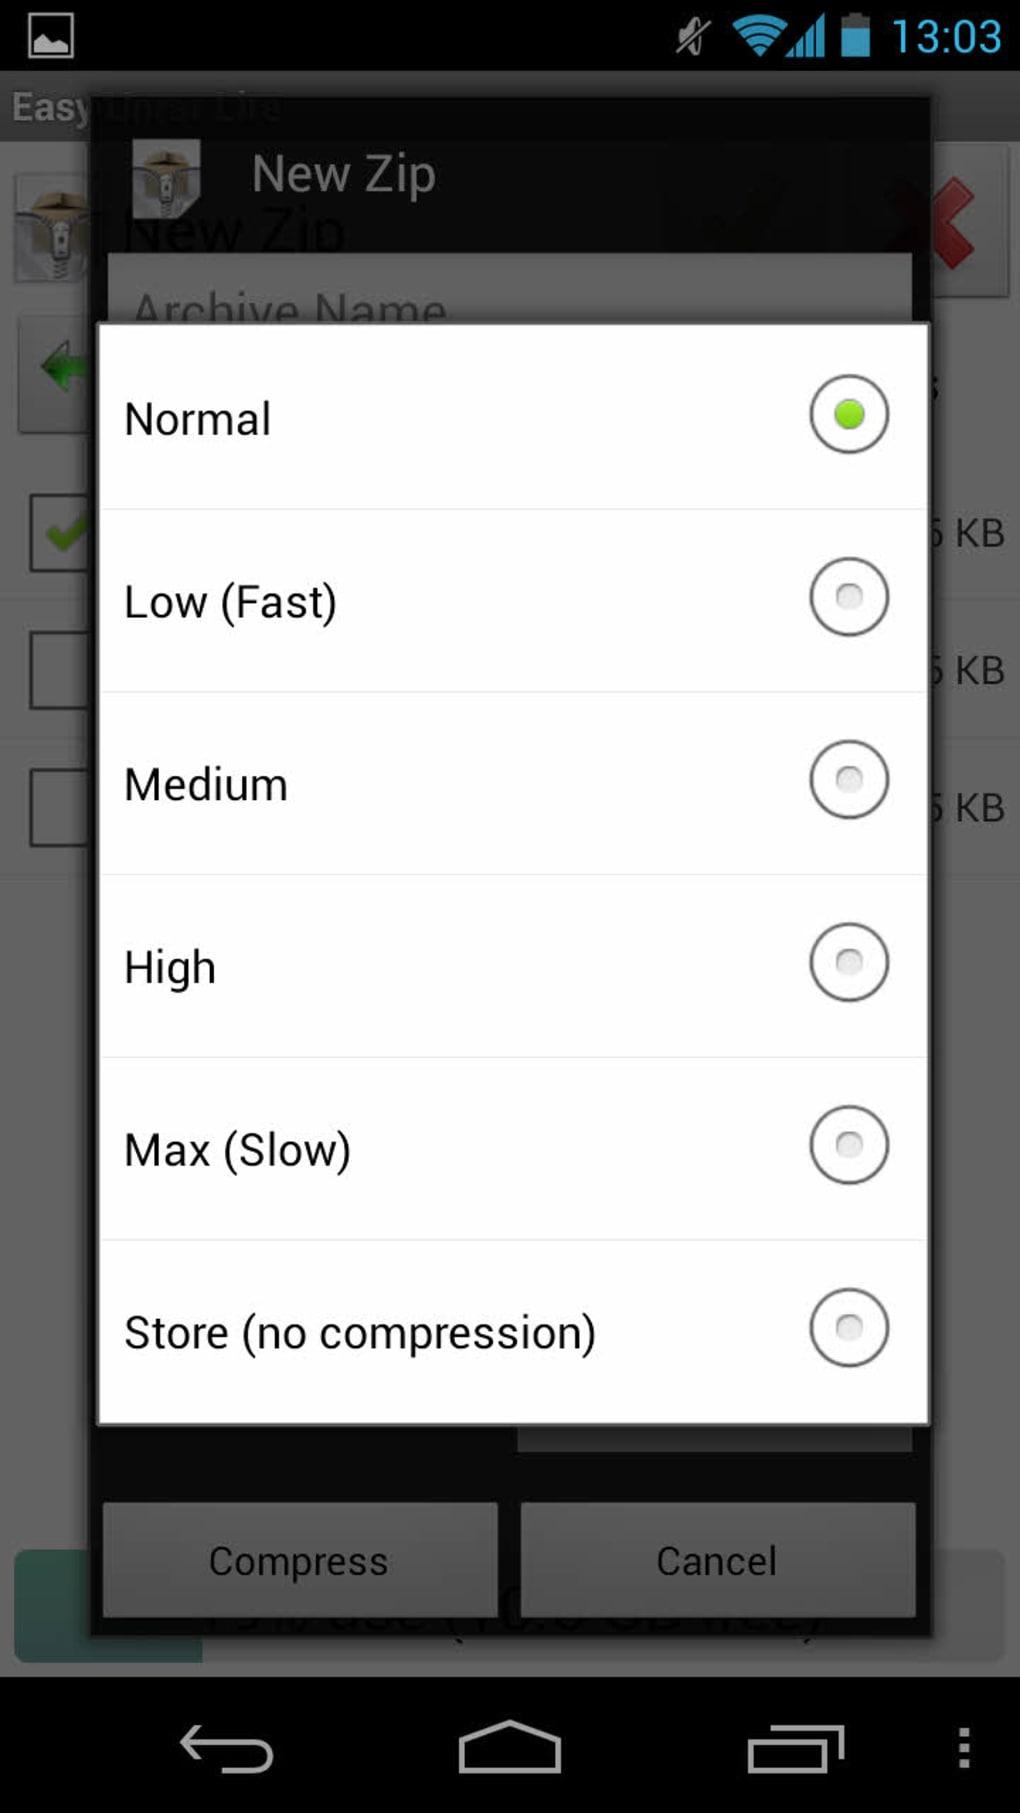 Easy Unrar, Unzip & Zip for Android - Download